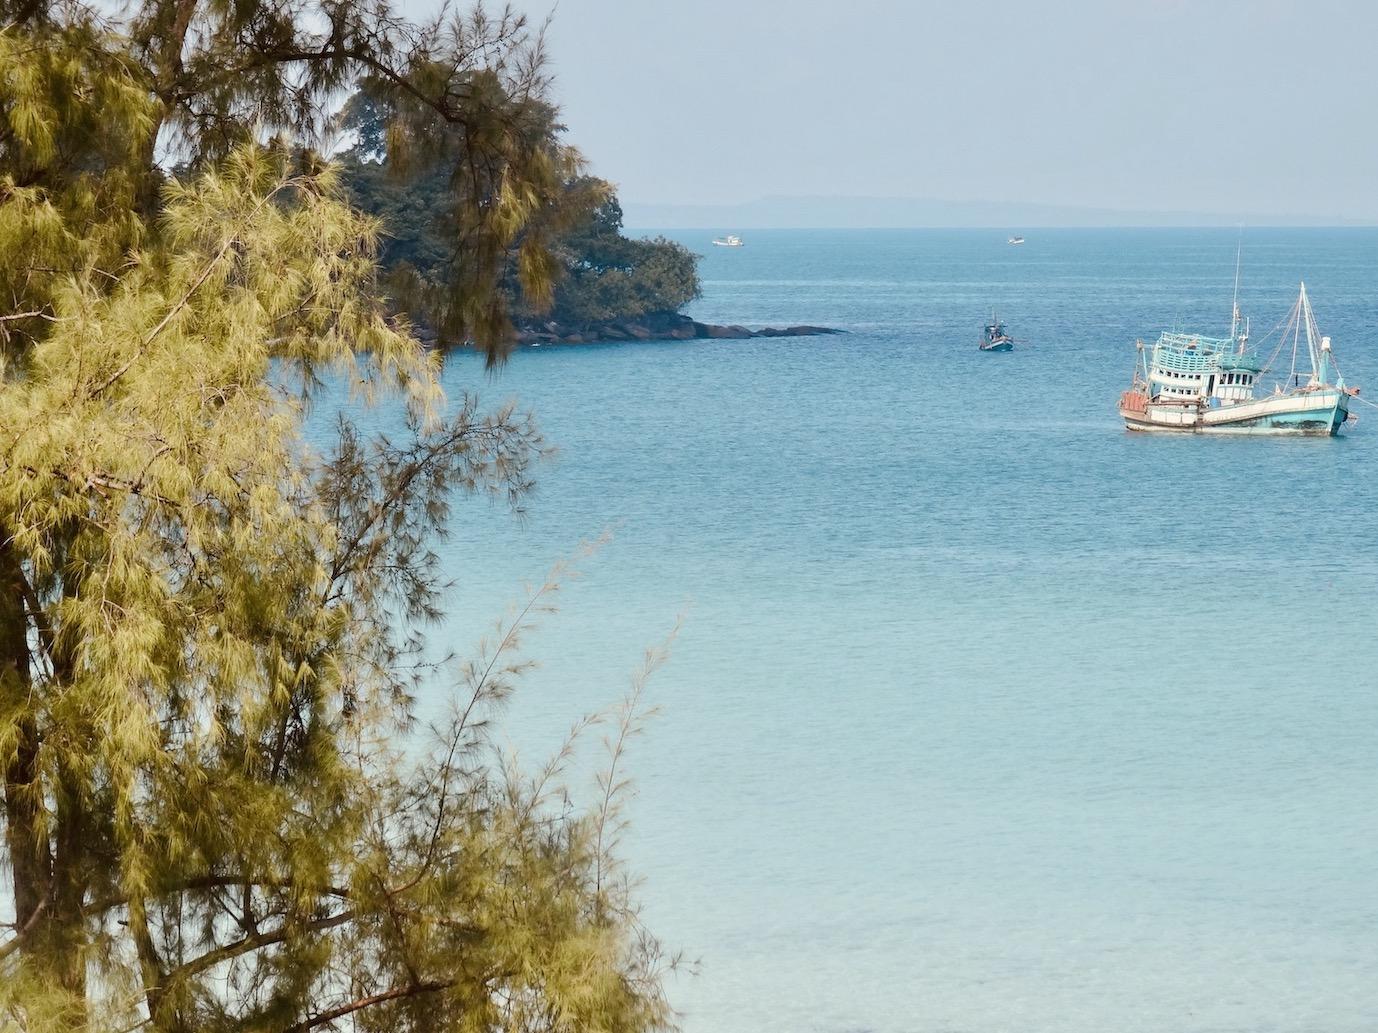 Gulf of Thailand Cambodia.